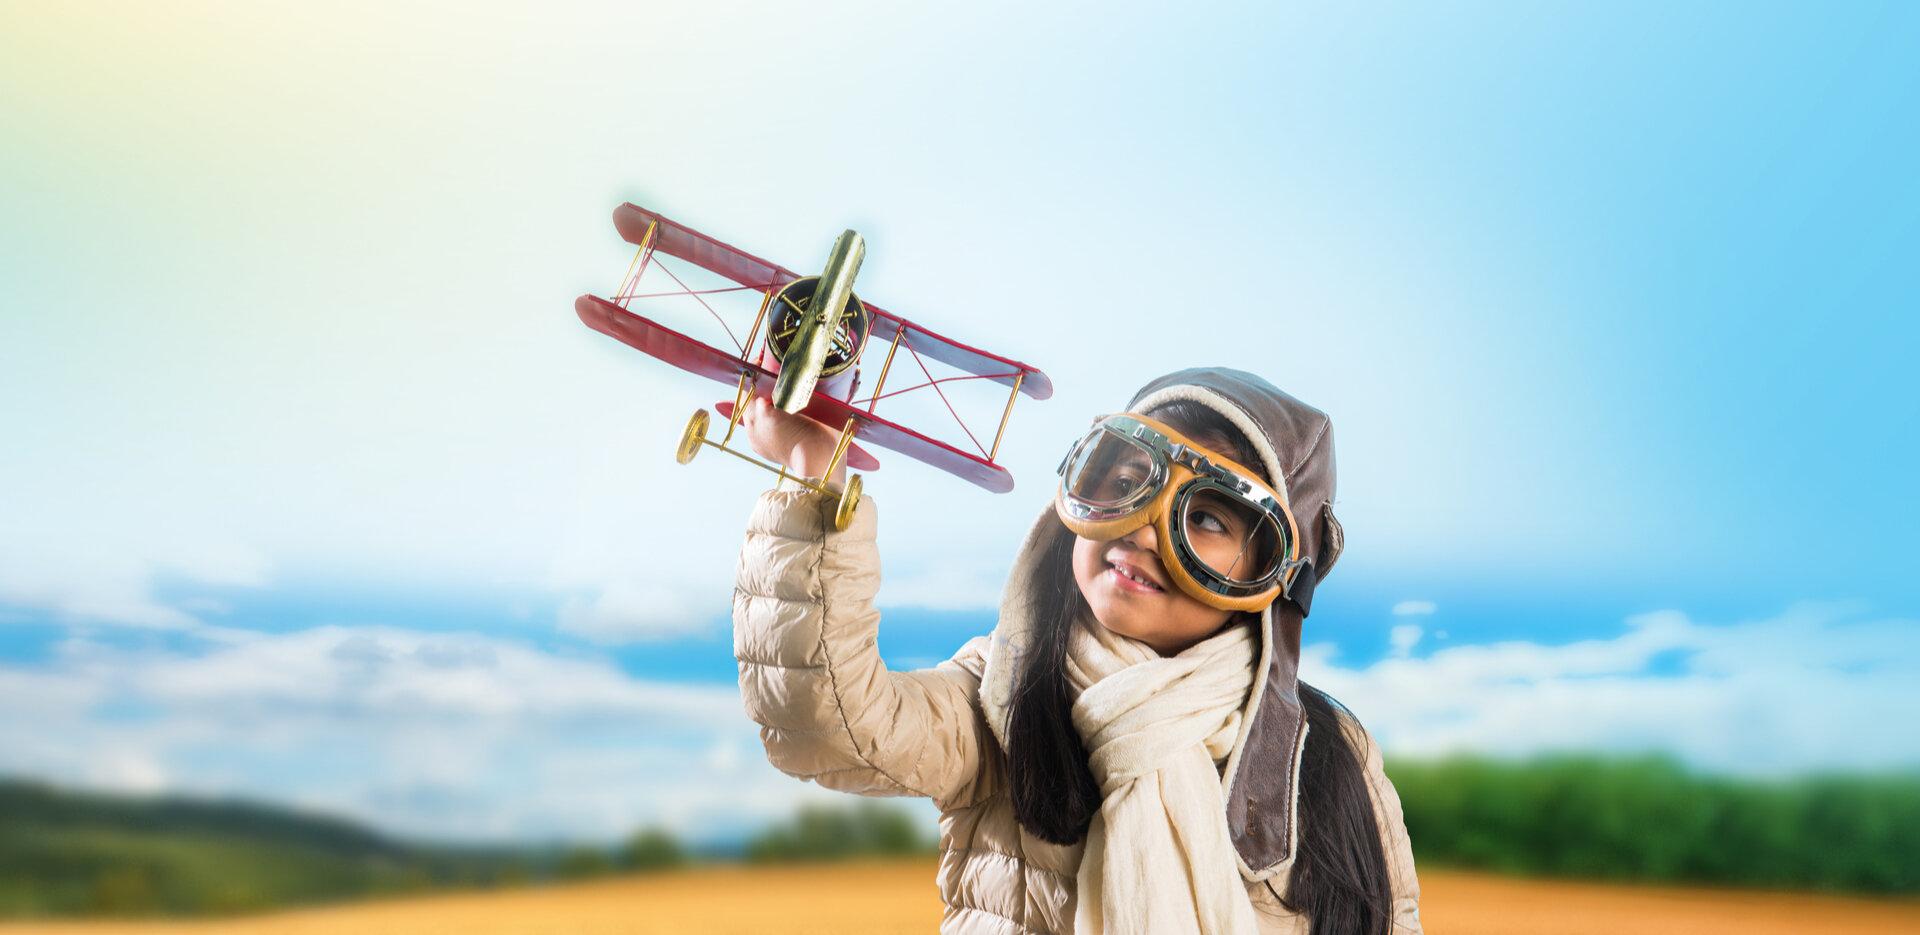 Child's Creativity Through Travel